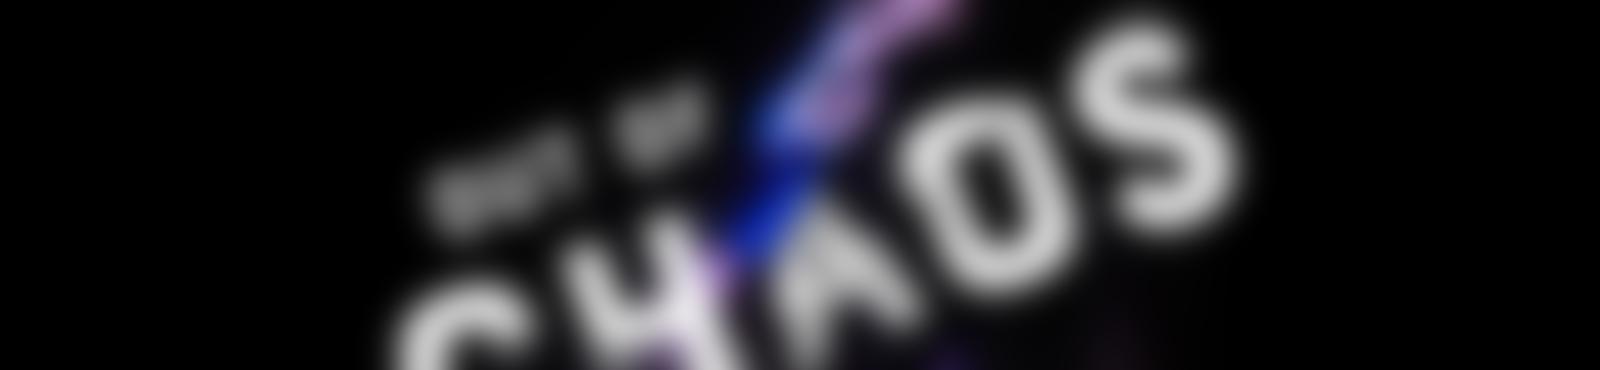 Blurred 573068cd 02b2 4bc5 a185 c83a0967e45a